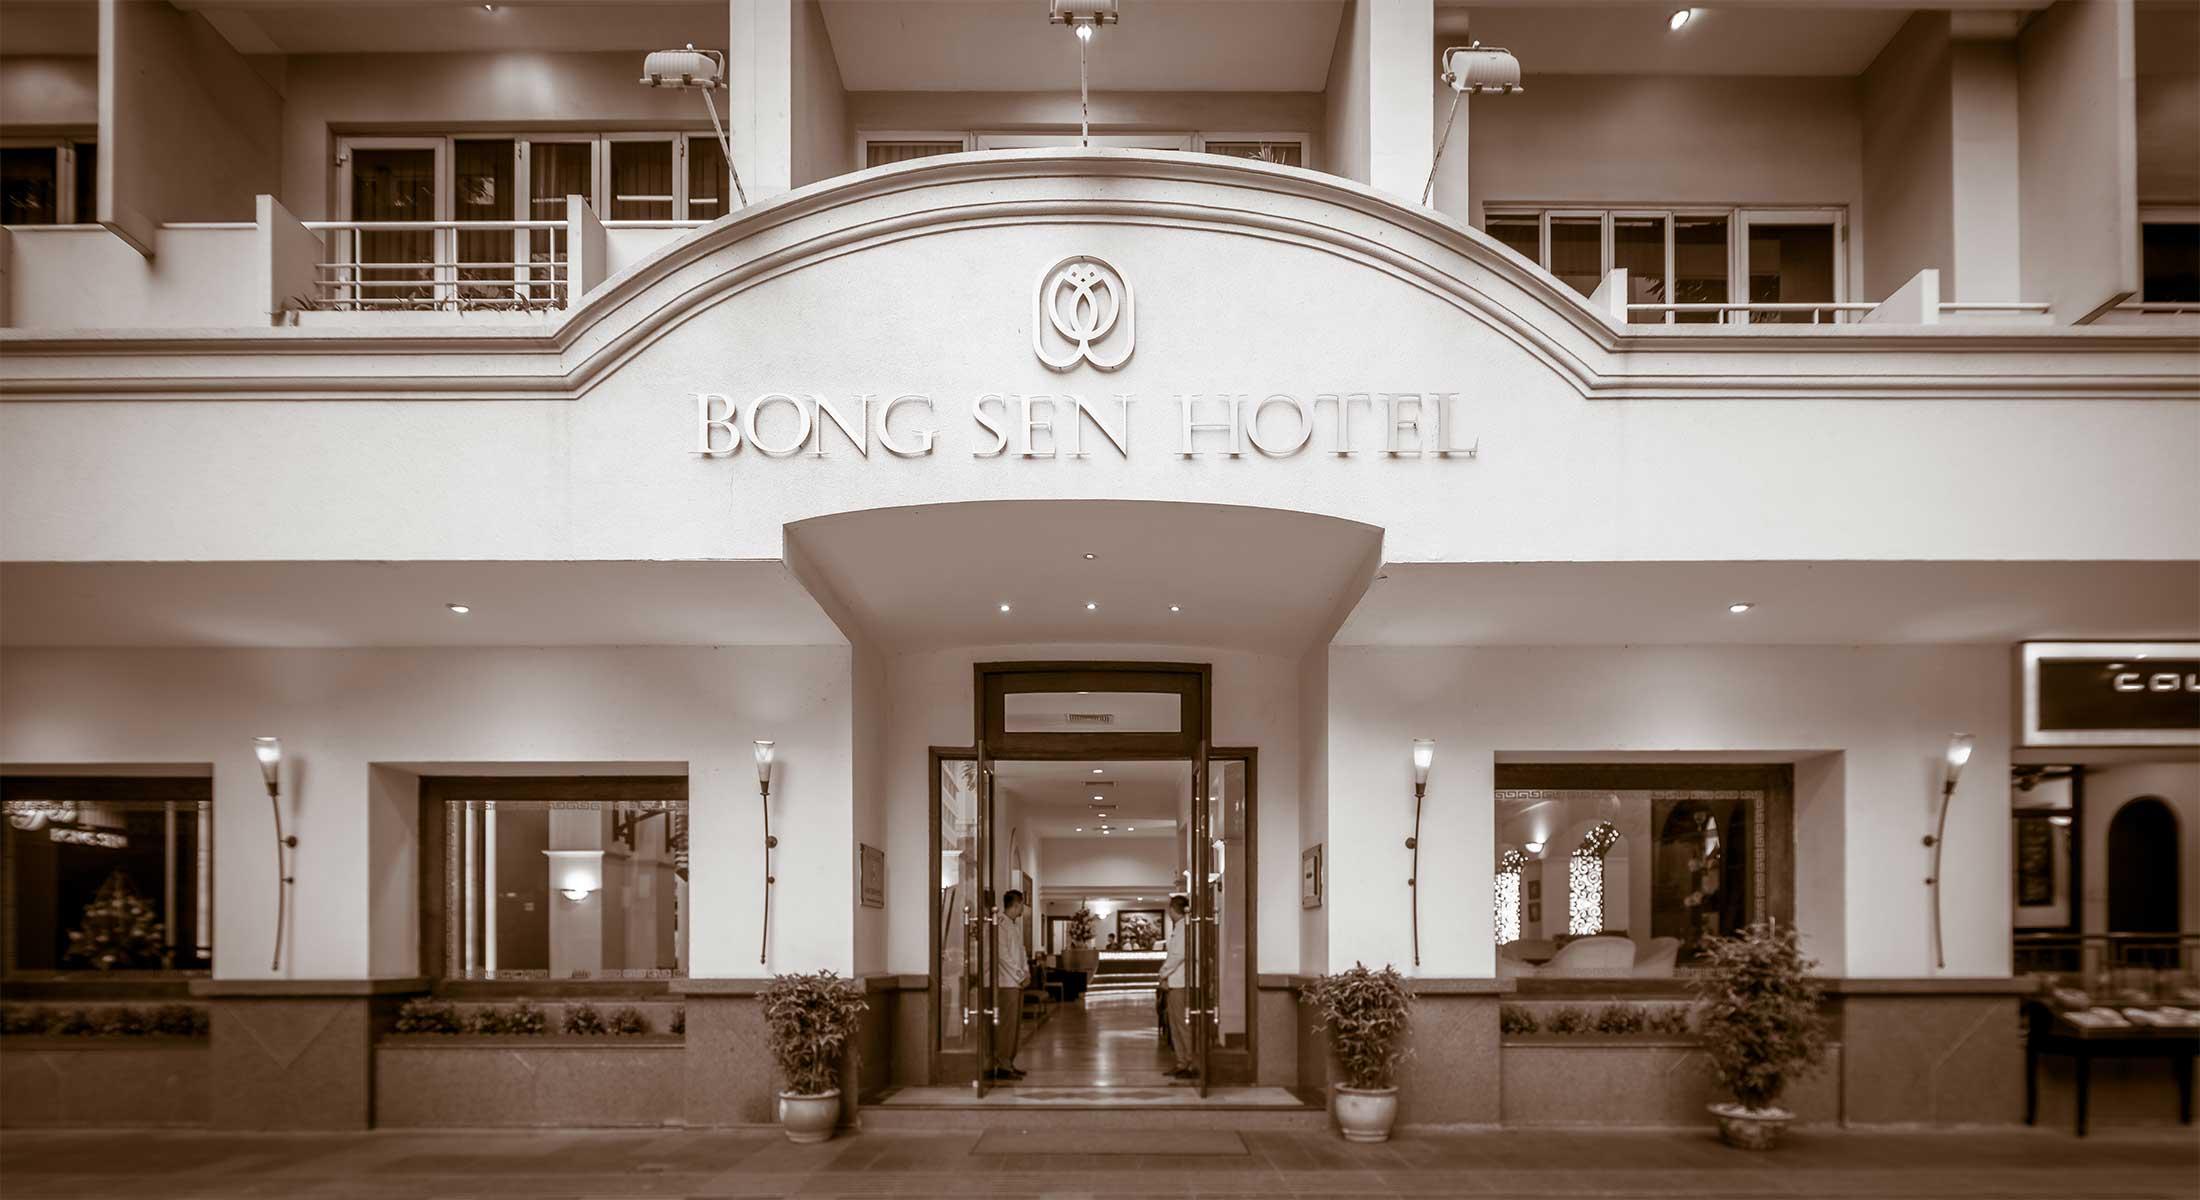 BongSen1_Sepia_Exterior-(3-of-5)